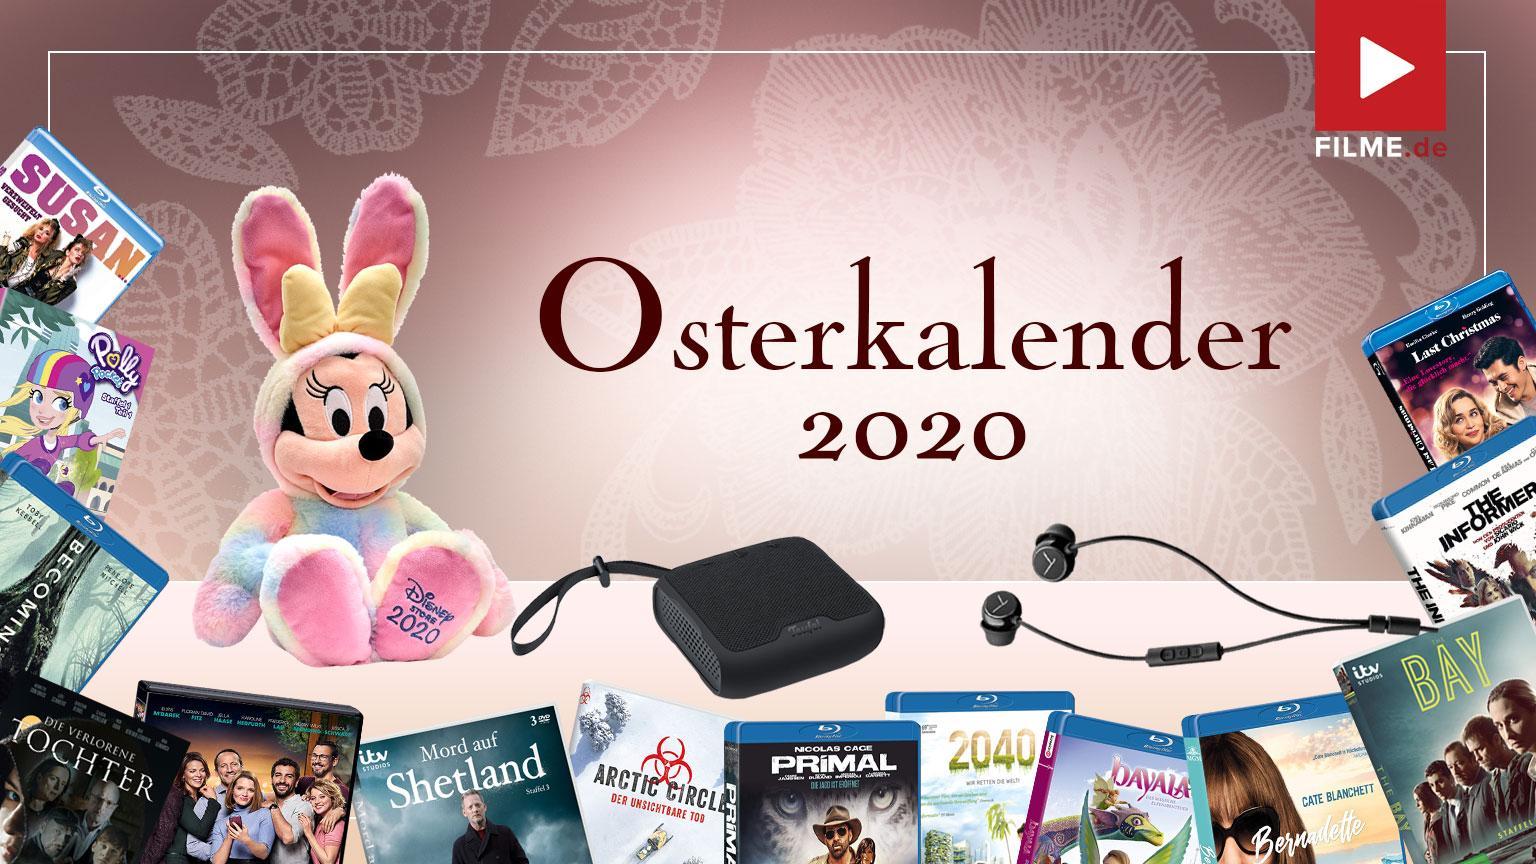 Ostergewinnspiel 2020 Artiklebild